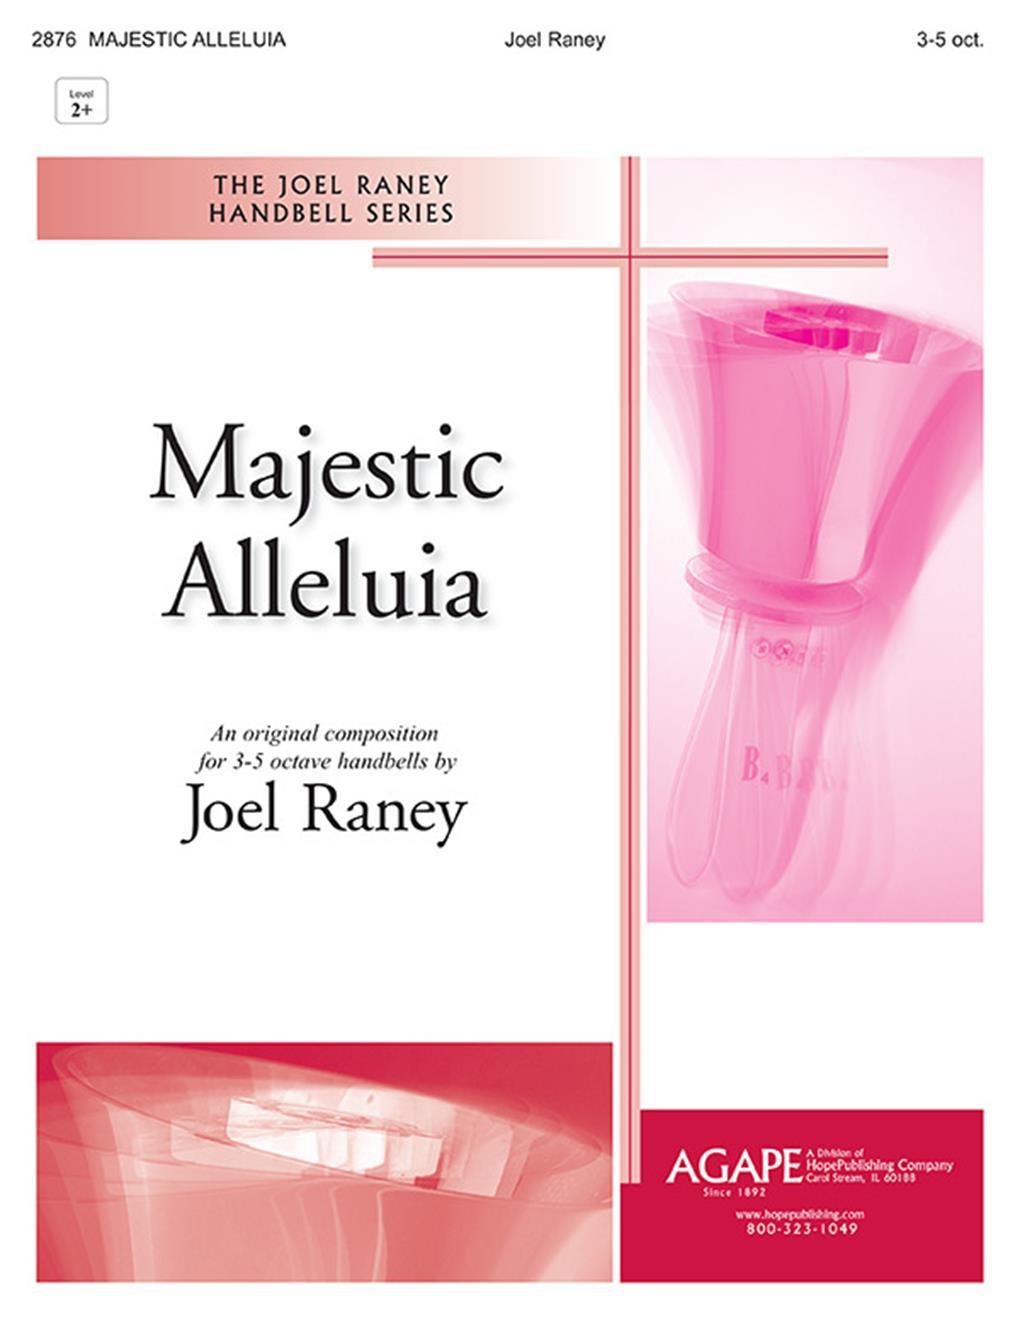 Majestic Alleluia - 3-5 oct. Level 2-3 Cover Image